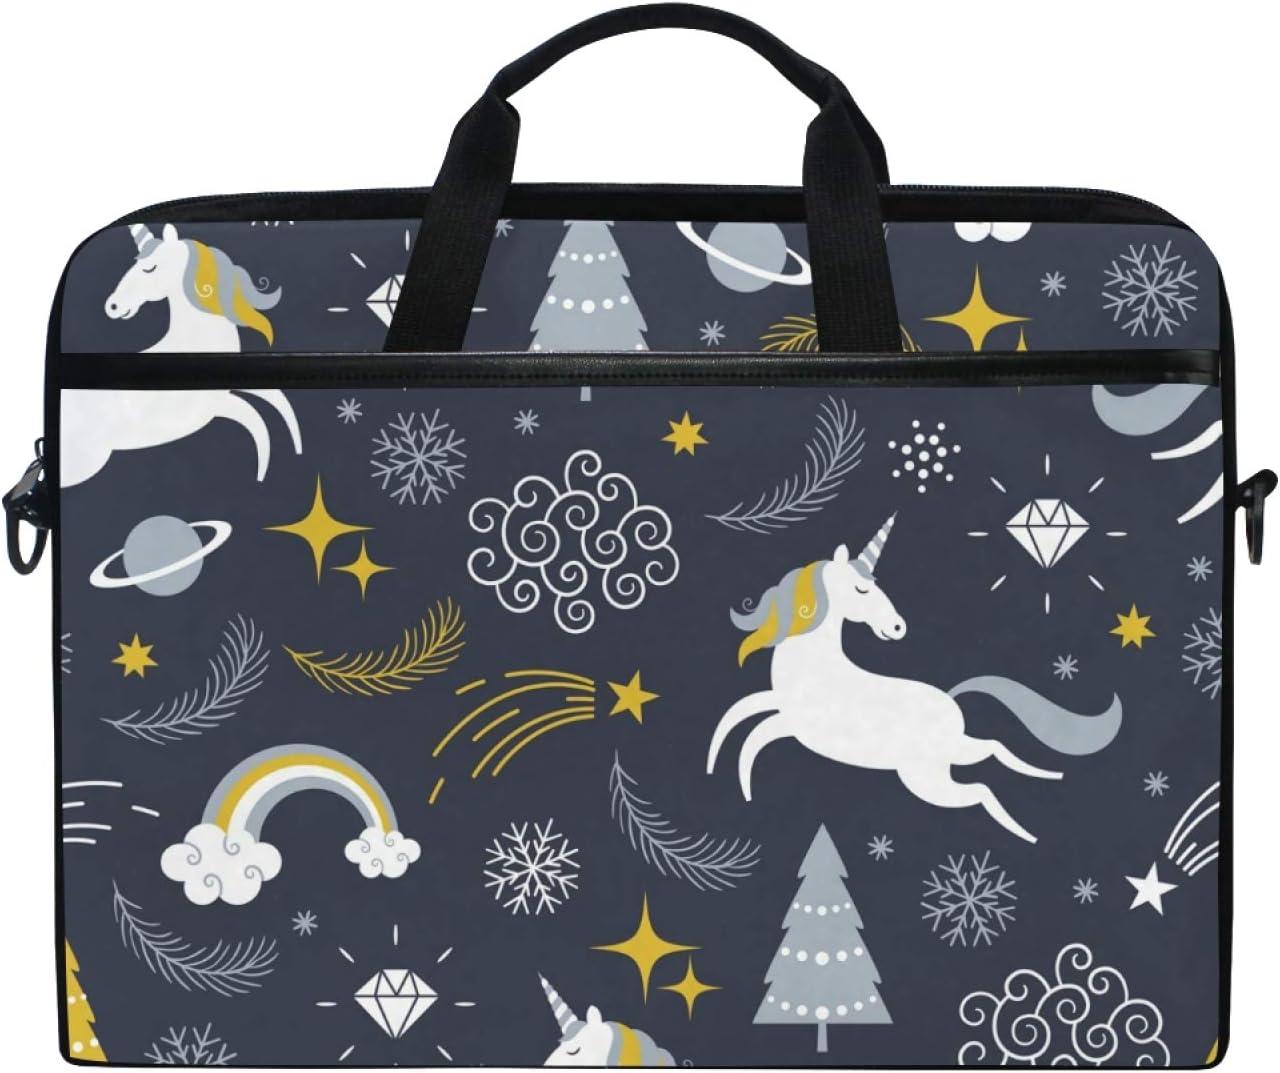 HousingMart 15 Inch Laptop Sleeve Bag Space Galaxy Unicorn Shoulder Laptop Bag Case Hand Bag Macbook Computer Bag for Women Men Kids